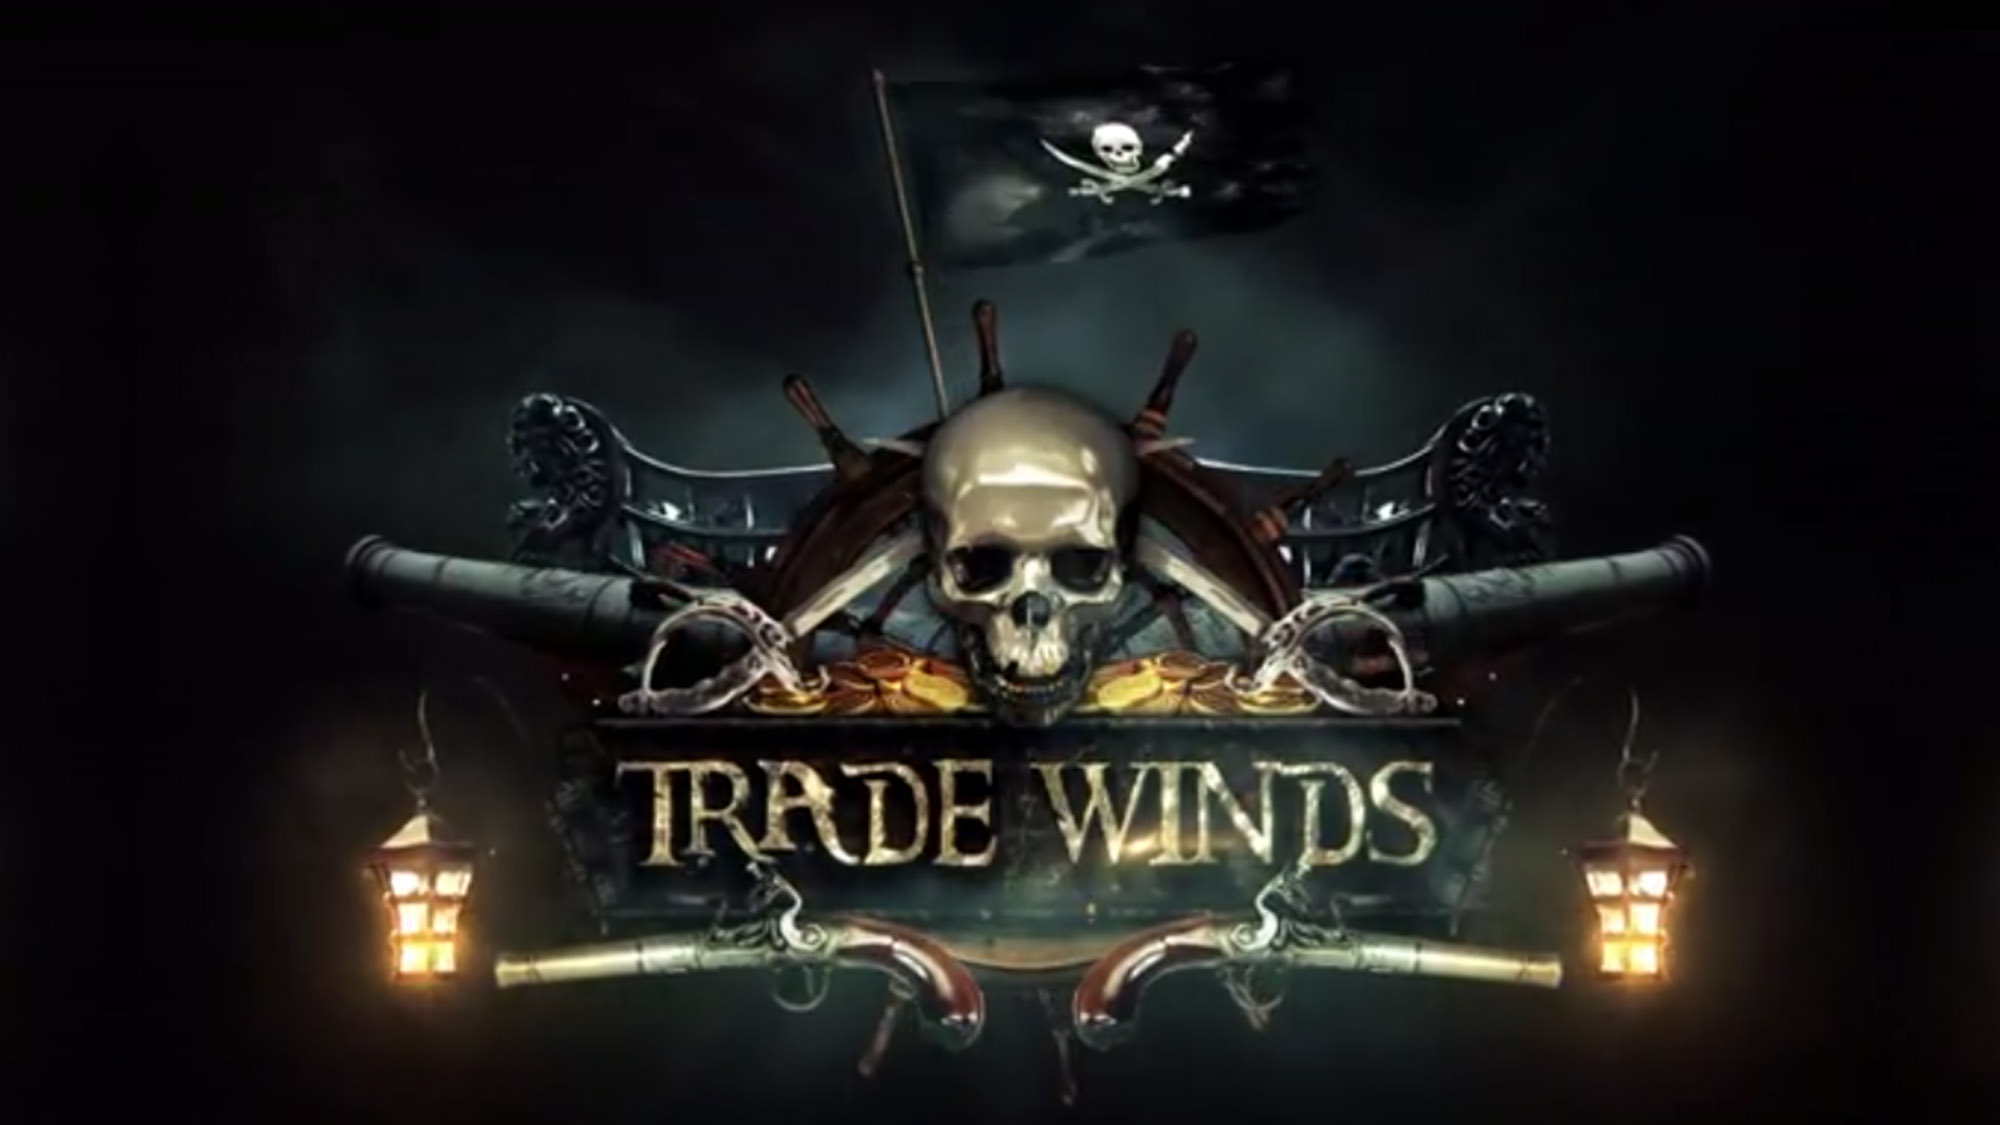 פעילויות צוות - טרייד ווינדס